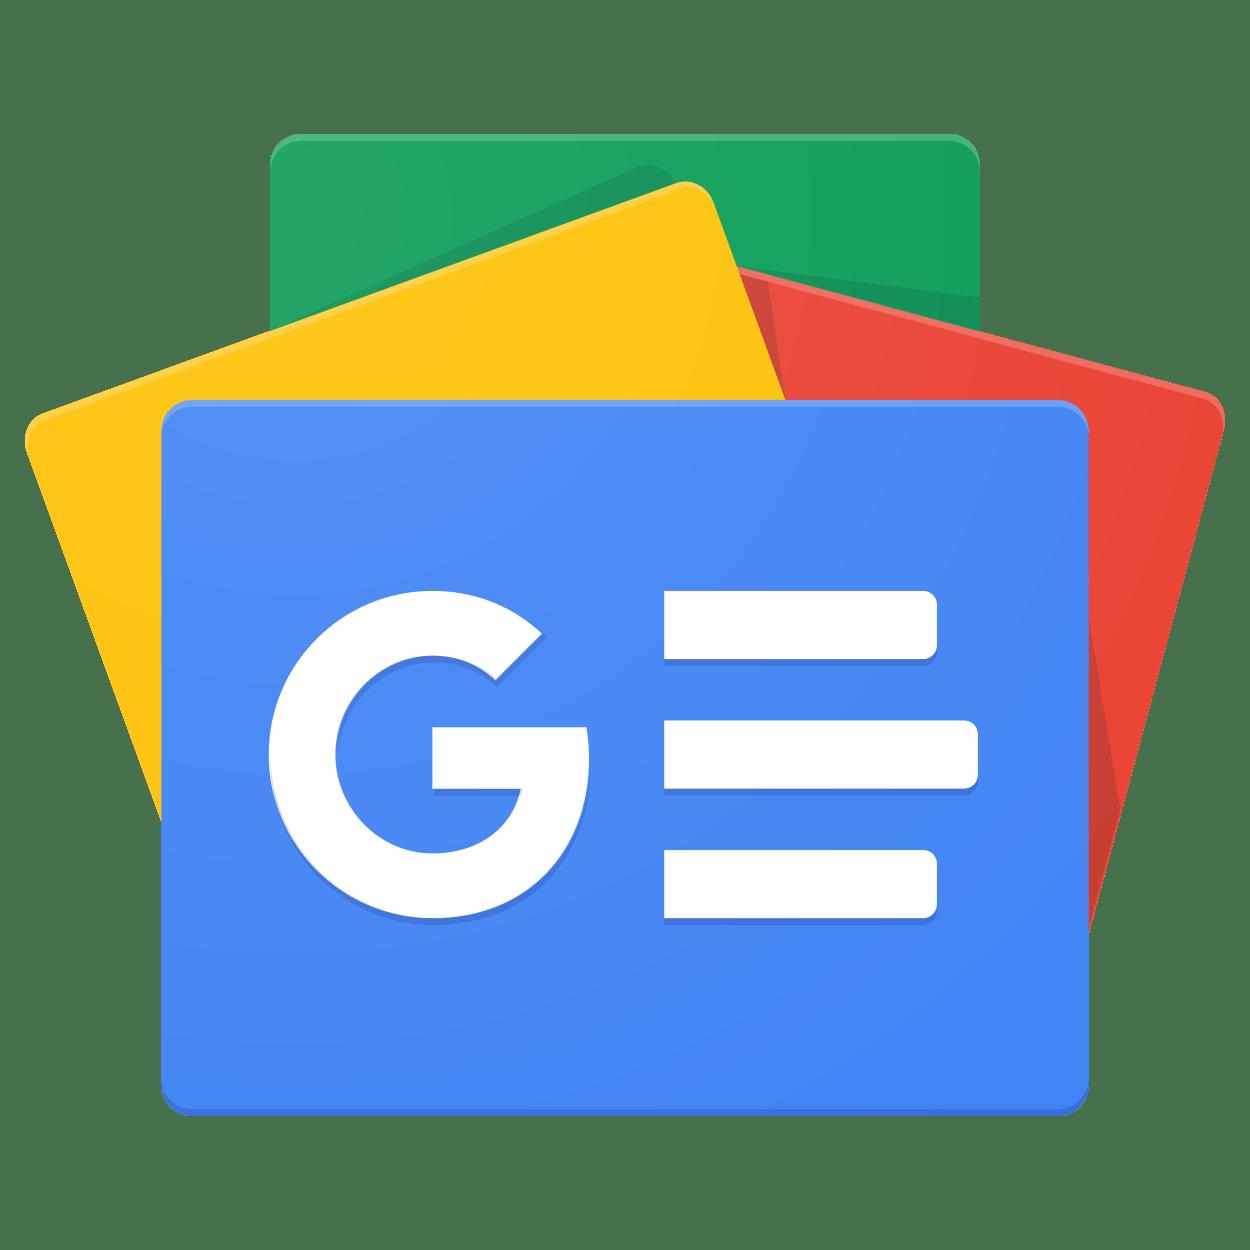 Google News Transparent Logo Image